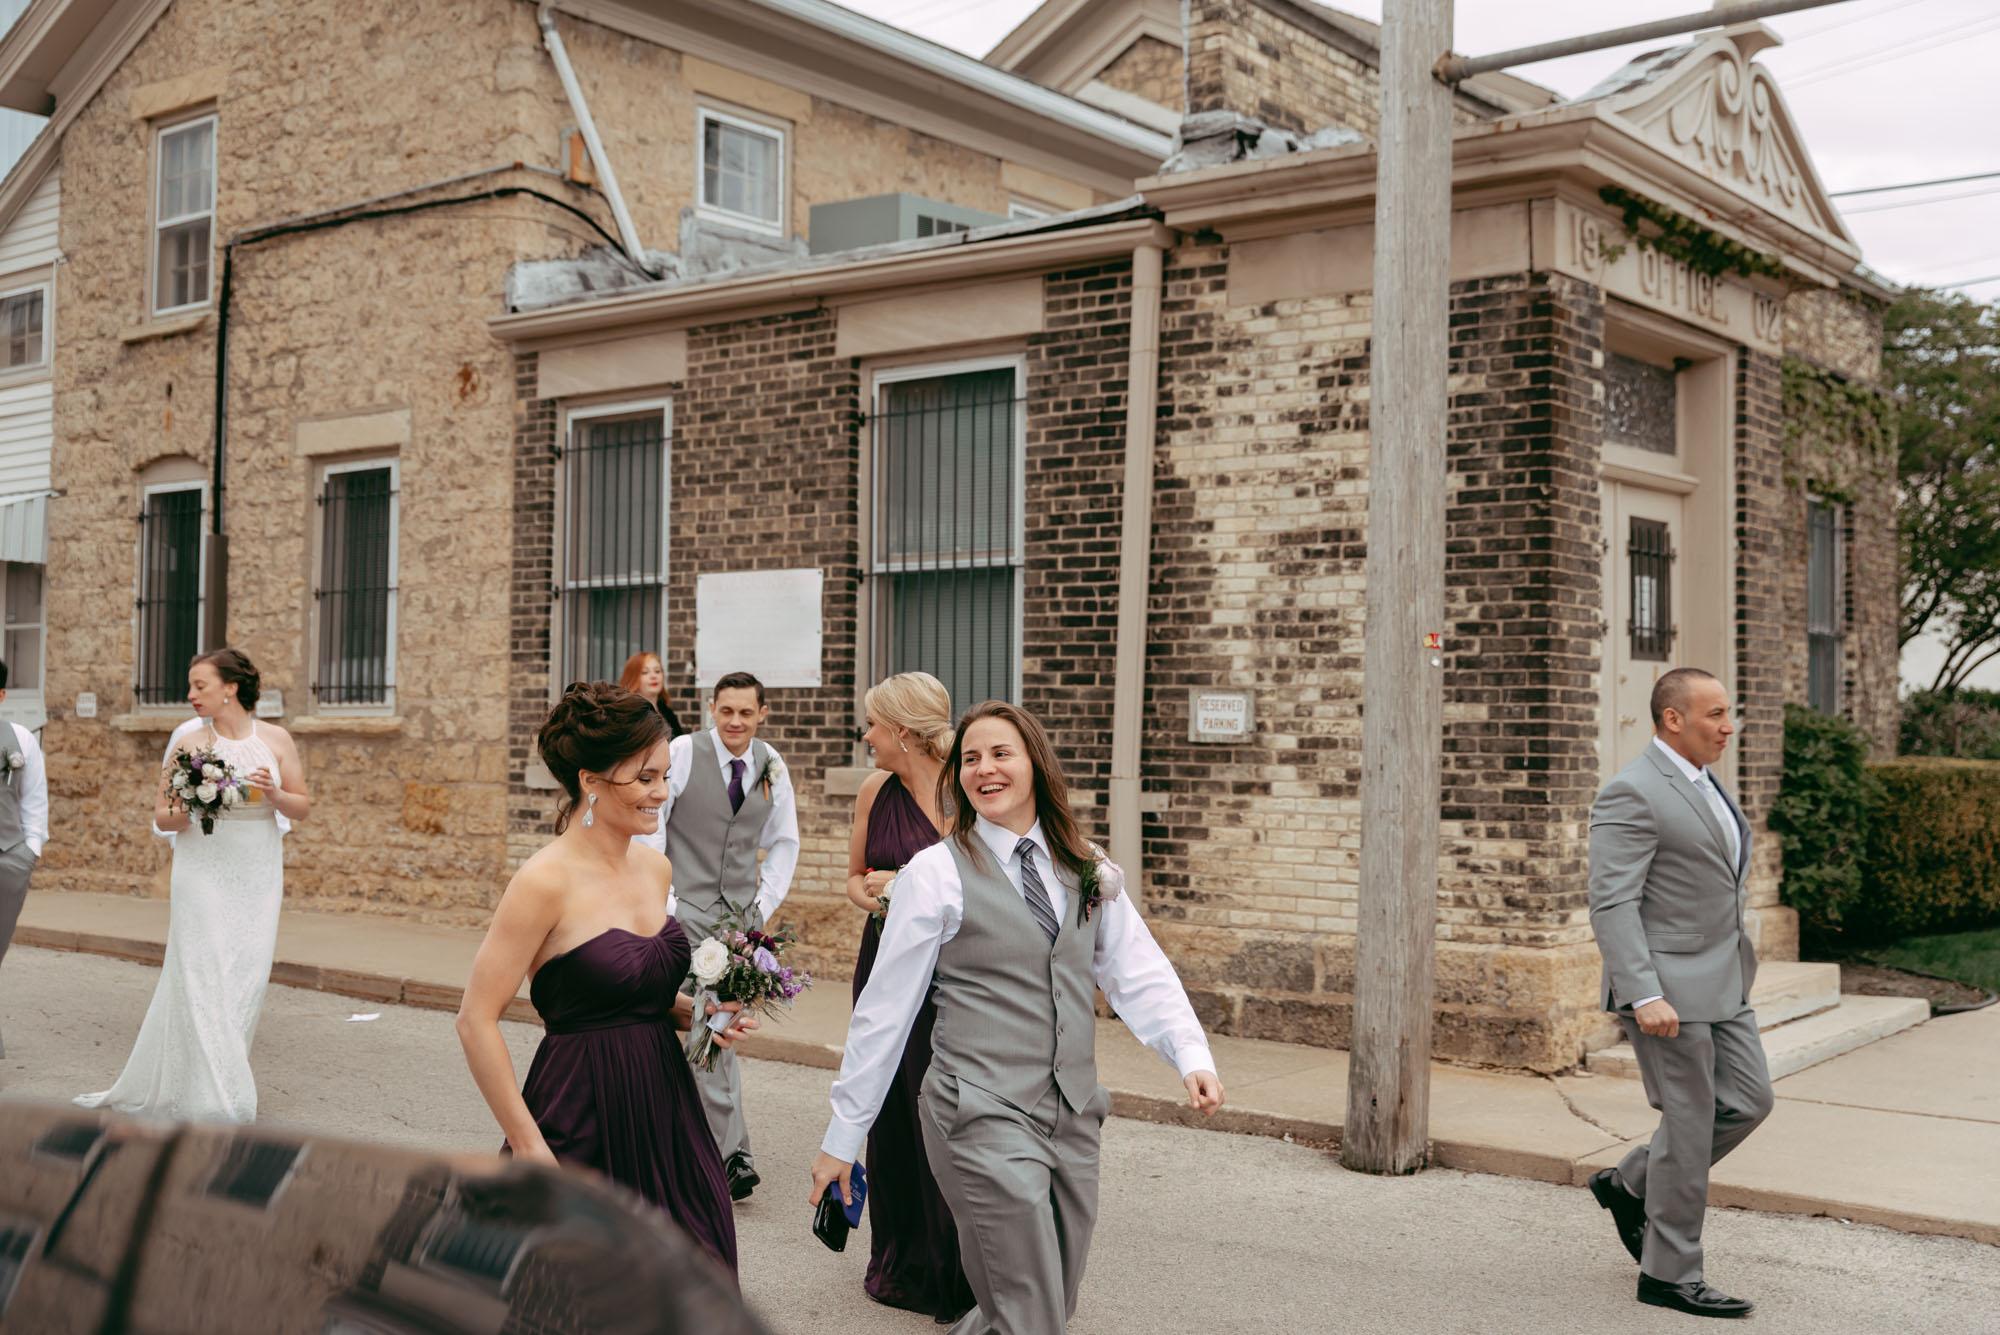 prairie-street-brewhouse-wedding-Rockford-IL-wedding-photographers-226.jpg